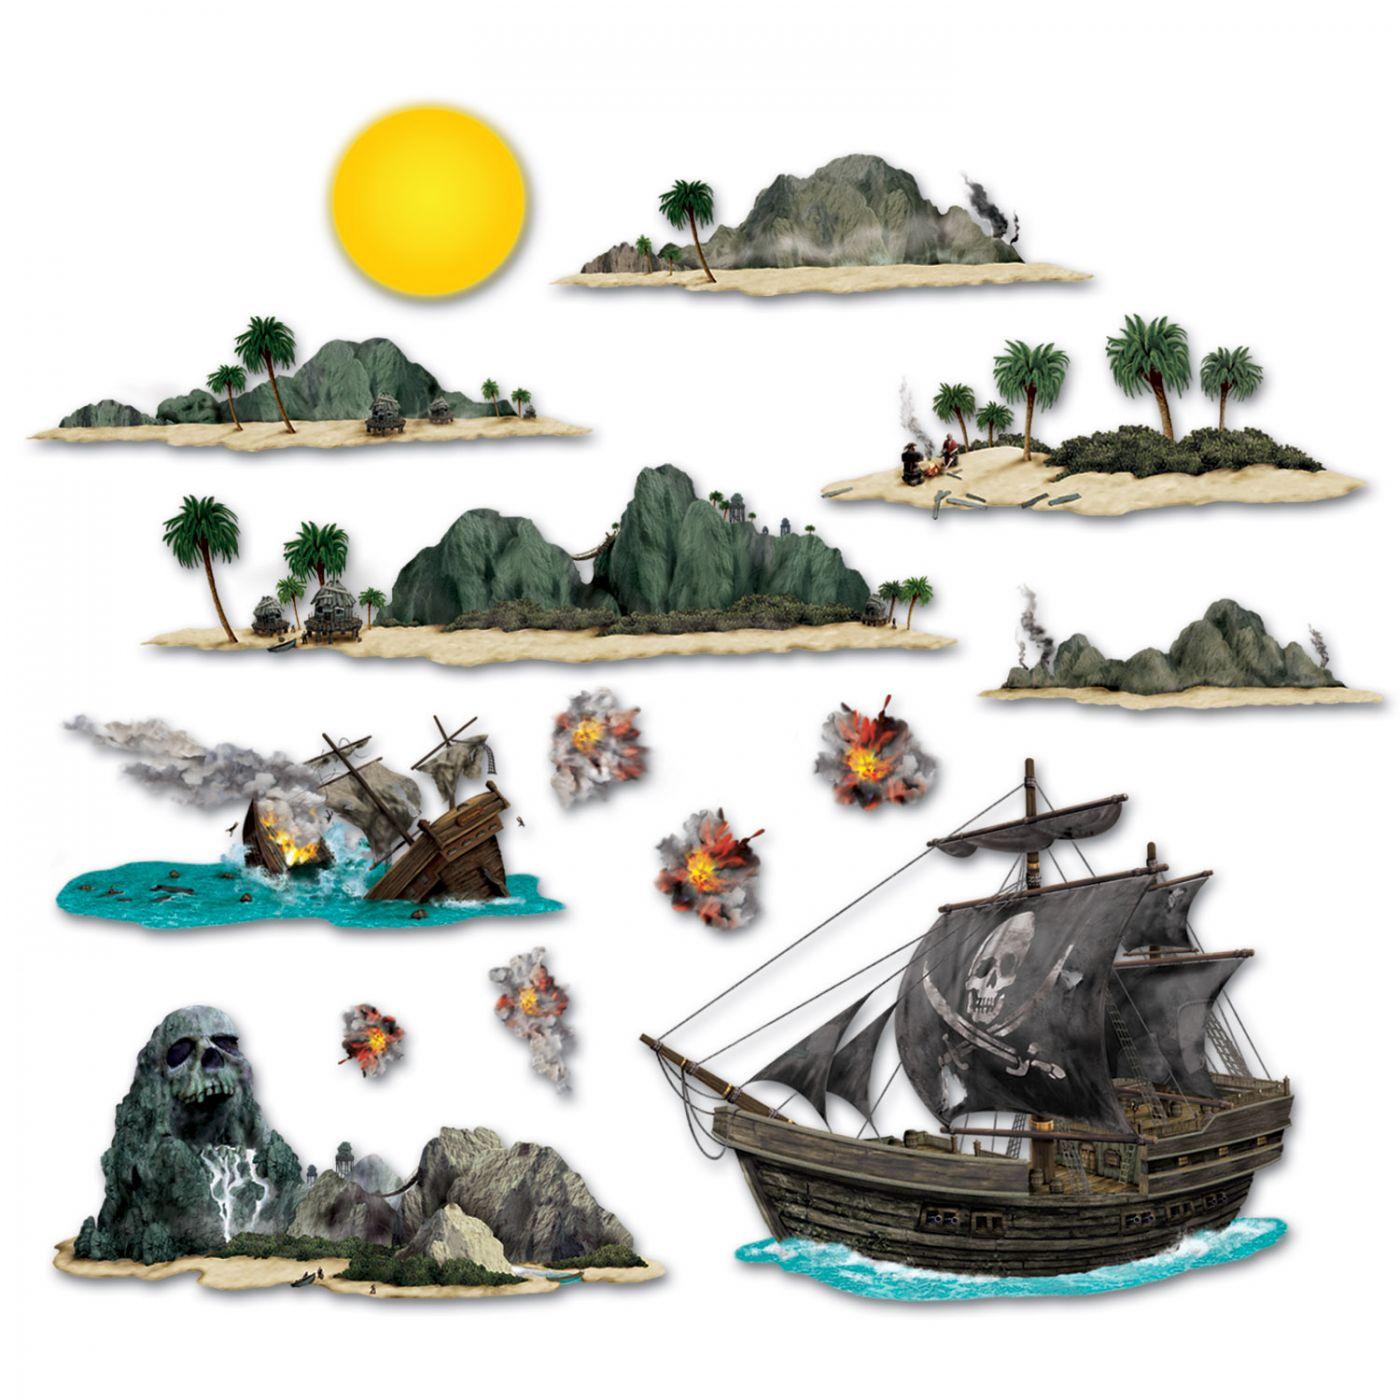 Pirate Ship & Island Props image